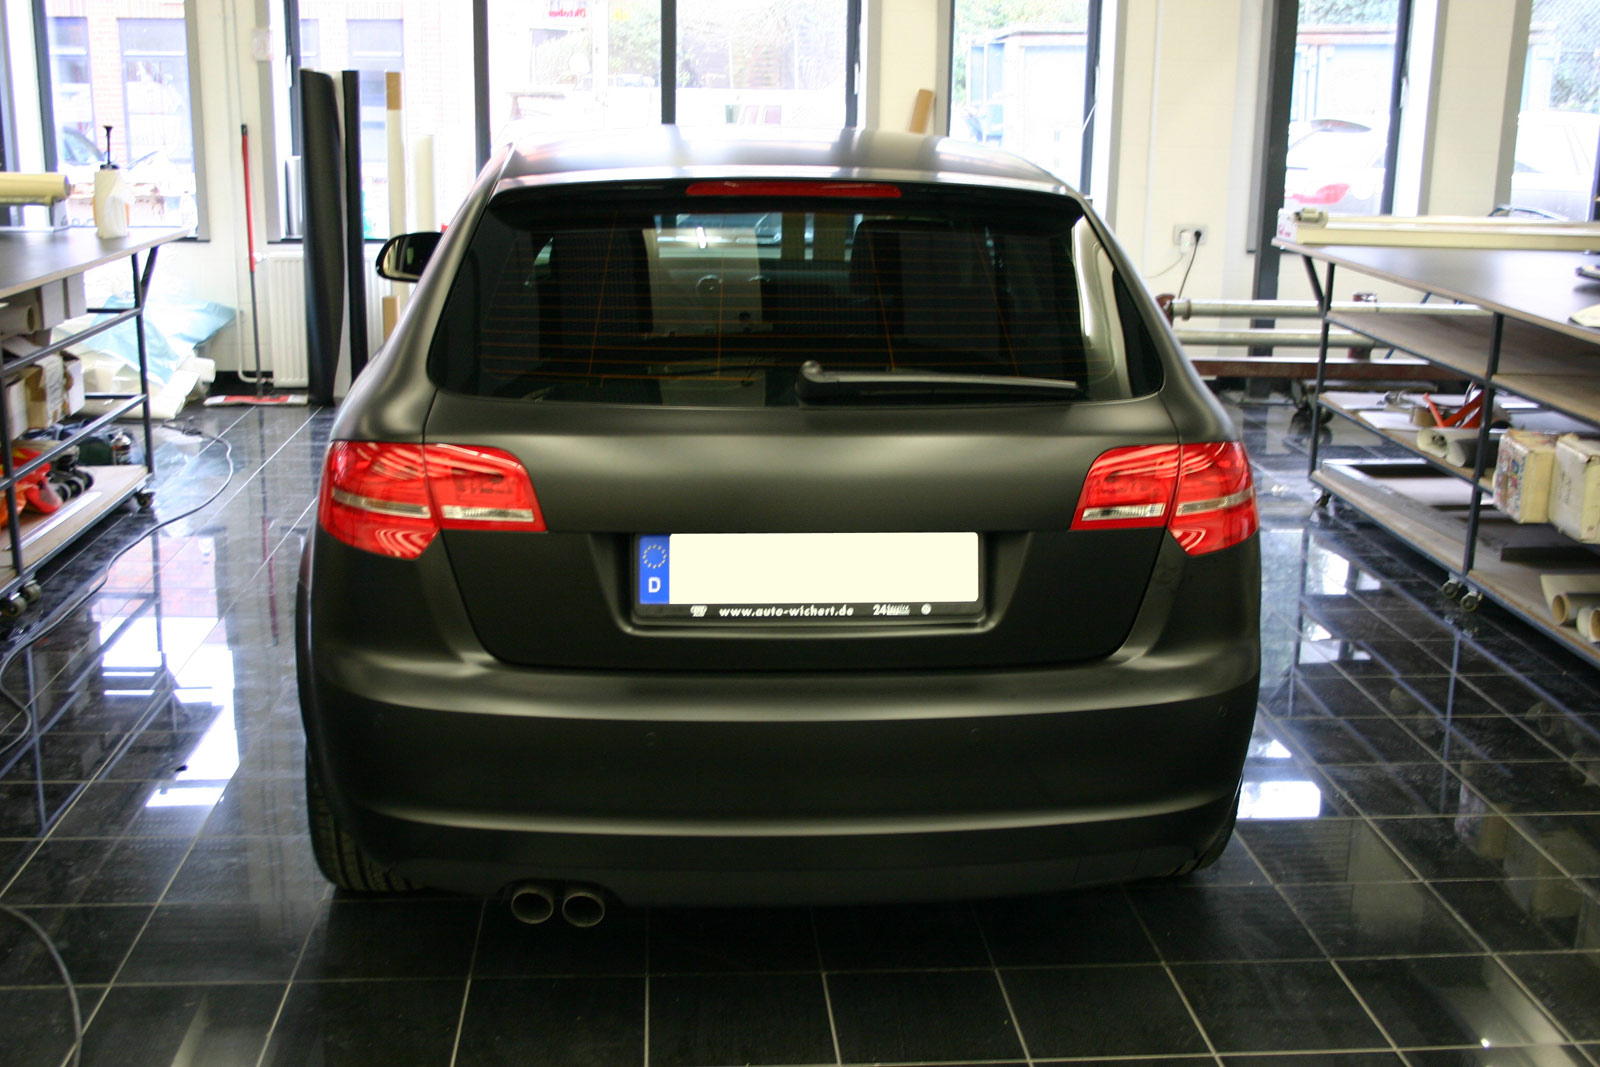 Audi_A3_Sportsback_Beklebung_Schwarz_Seidenmatt_01